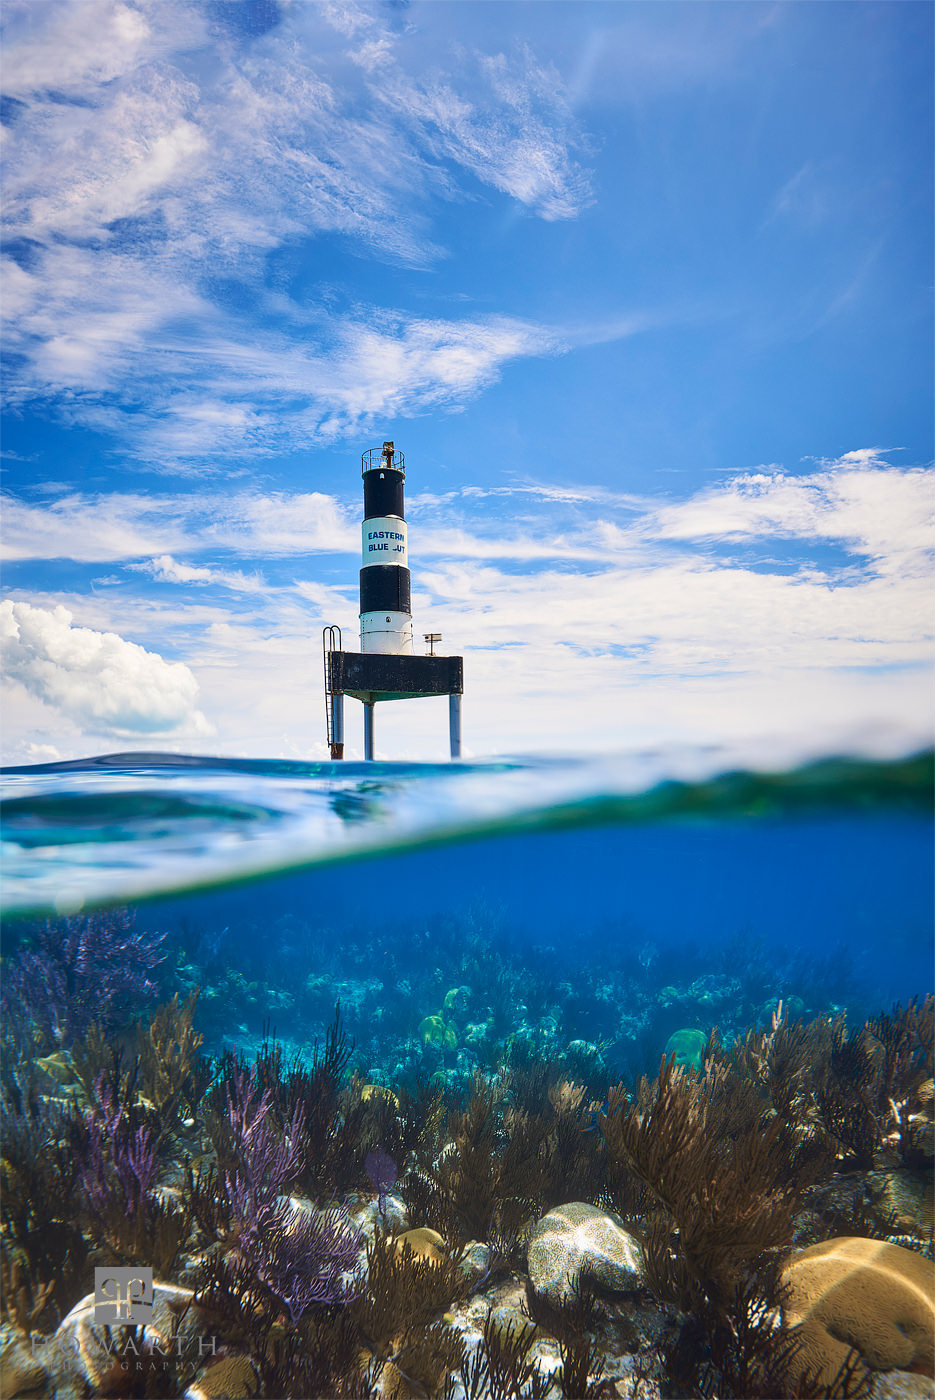 Eastern, Blue, Cut, water, snorkeling, dive, photo